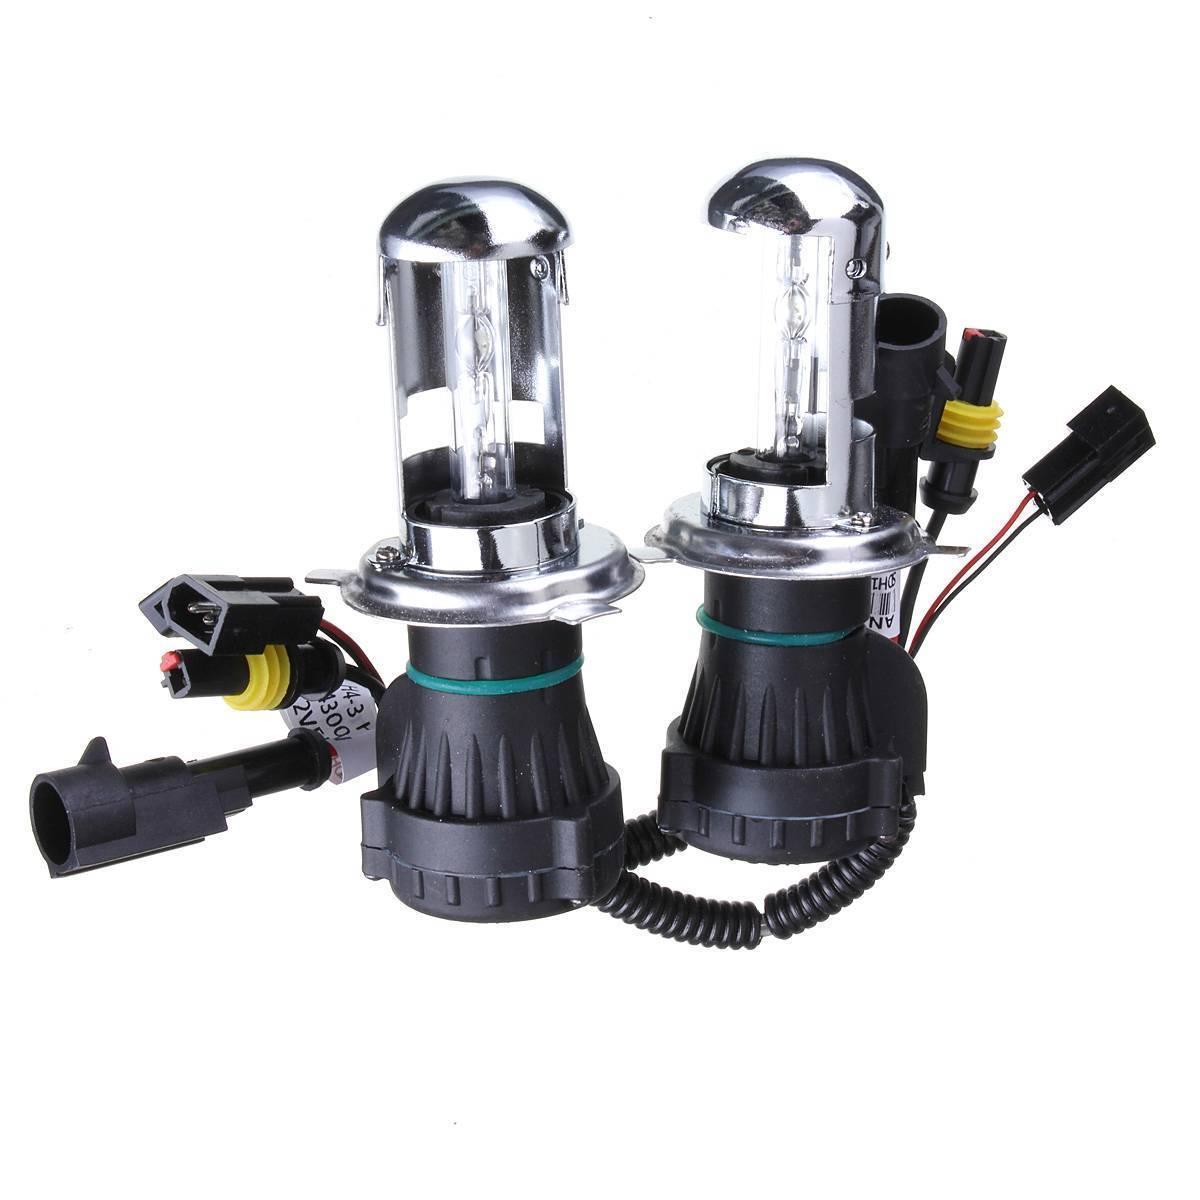 2X Bulb AUTO HID BI-Xenon Beam HI / LOW Bulb H4 (35W, 10000K) hot sale high quality auto xenon hid conversion kit 12v 35w h4 hi low dual beam 10000k freeshipping